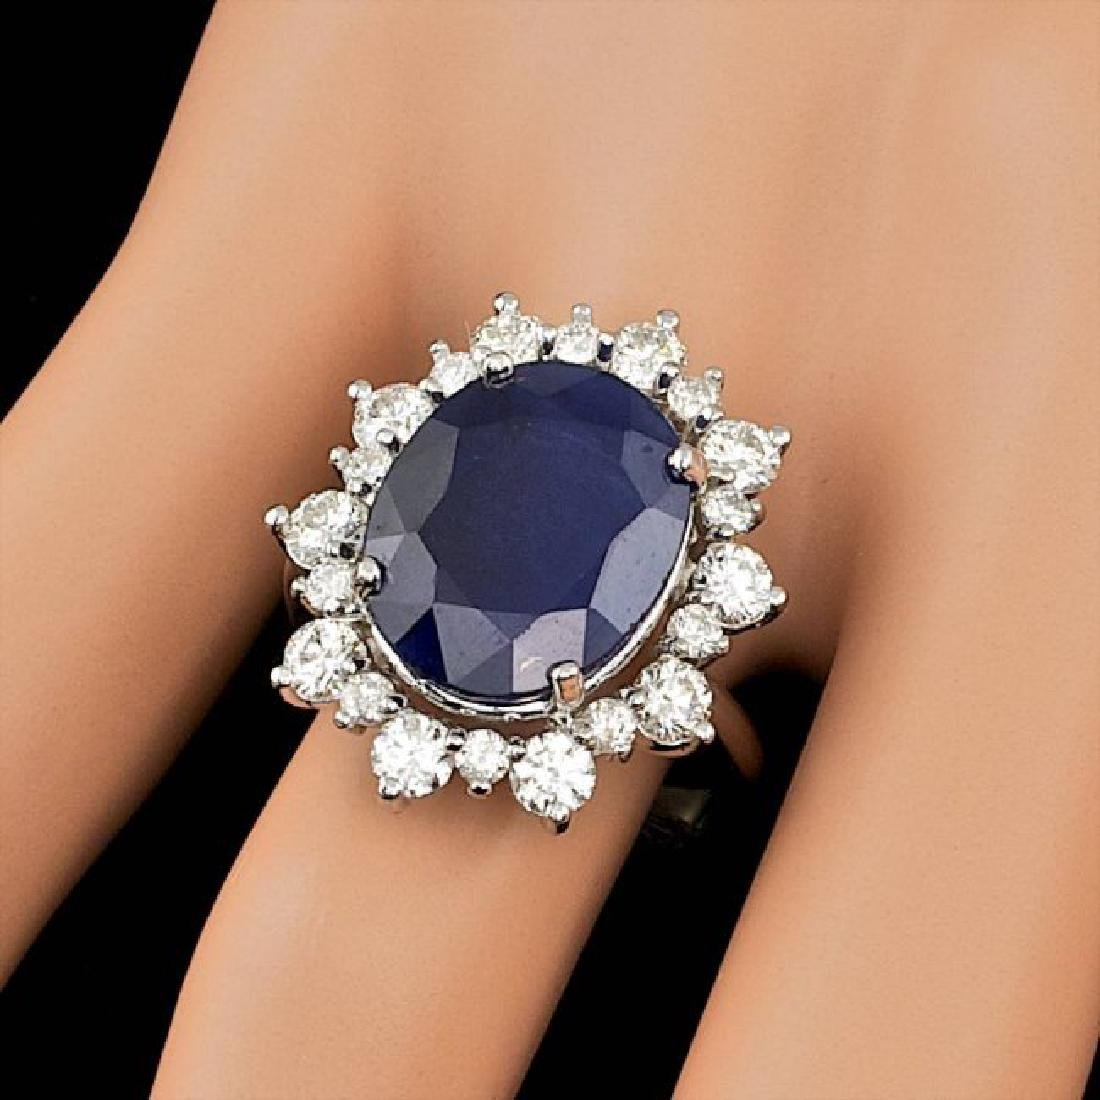 14k Gold 10.00ct Sapphire 1.35ct Diamond Ring - 4